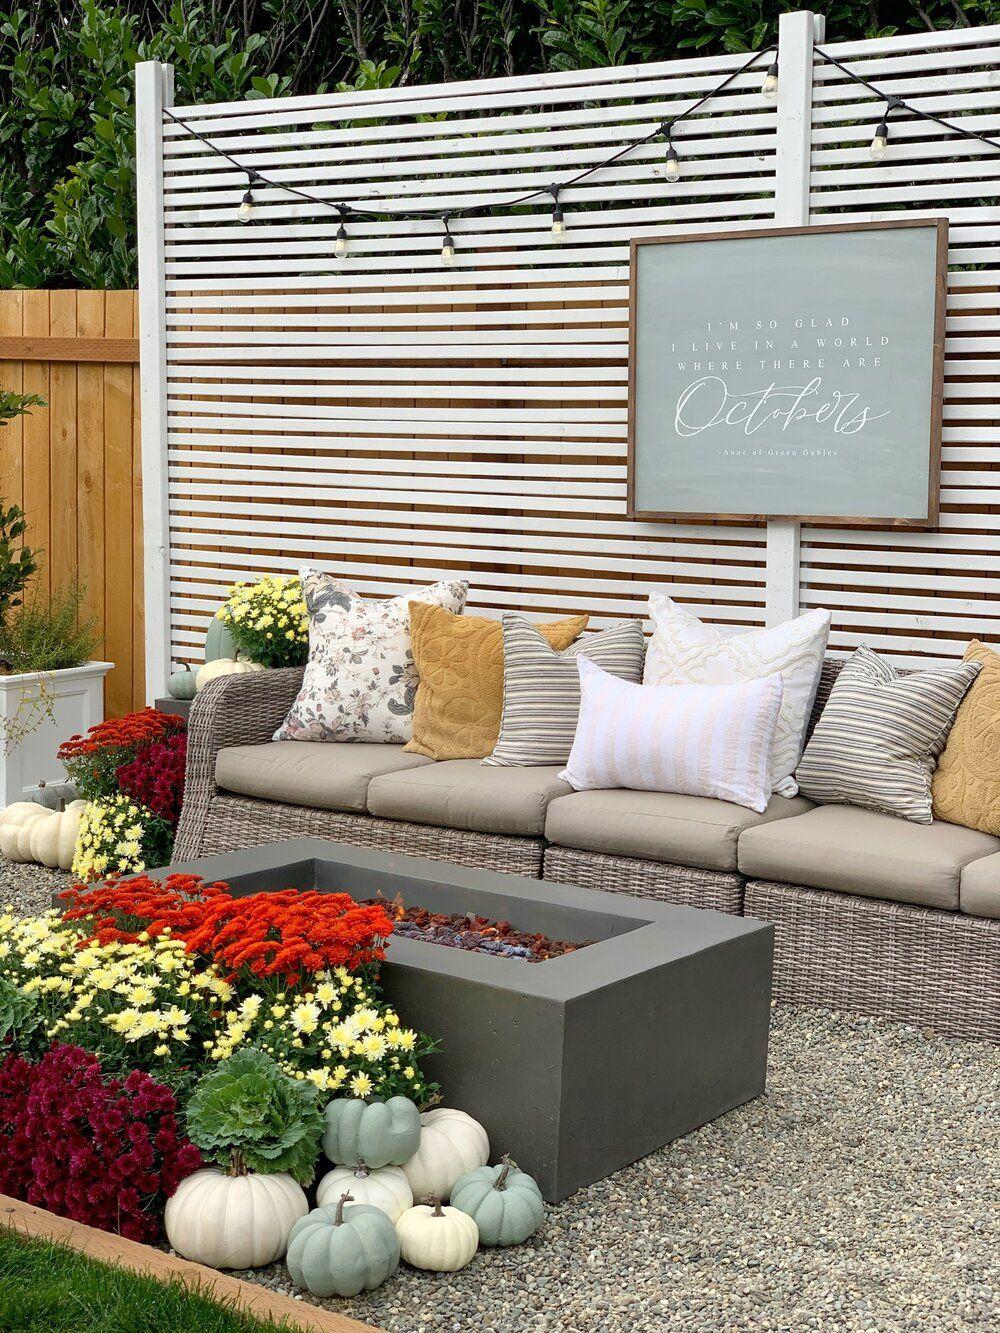 How to make your backyard cozy for fall   Backyard ...